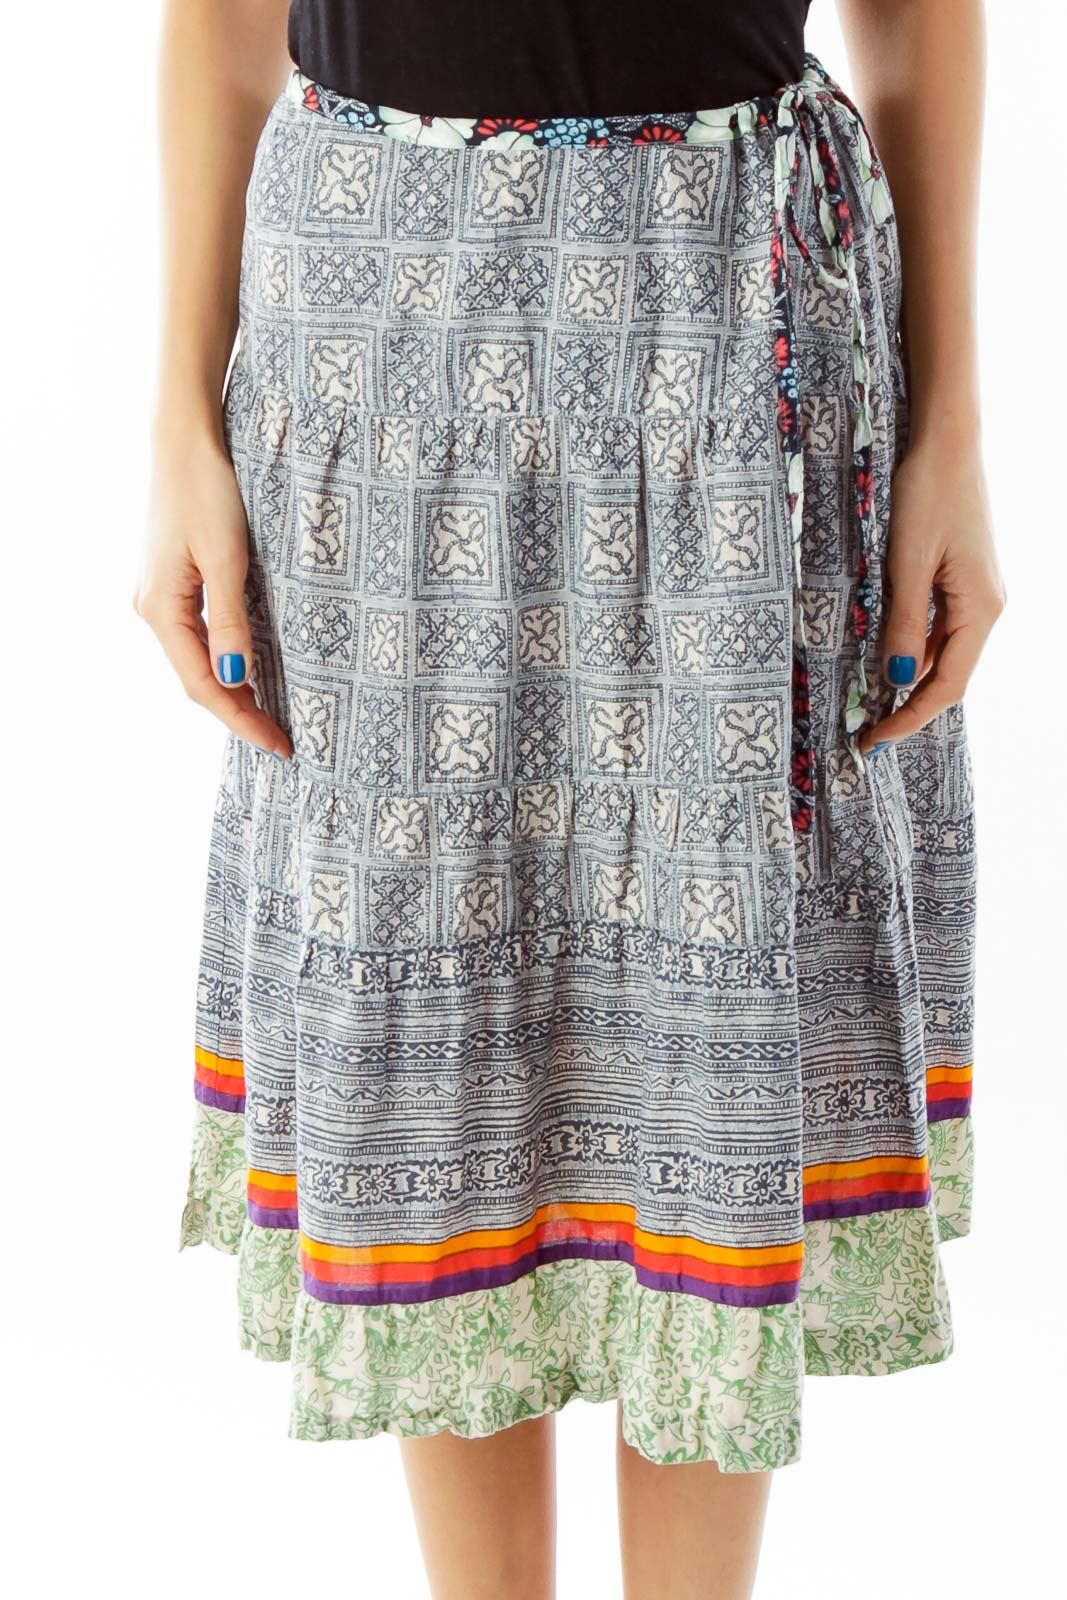 Multicolor Tribal Print Flared Skirt Front